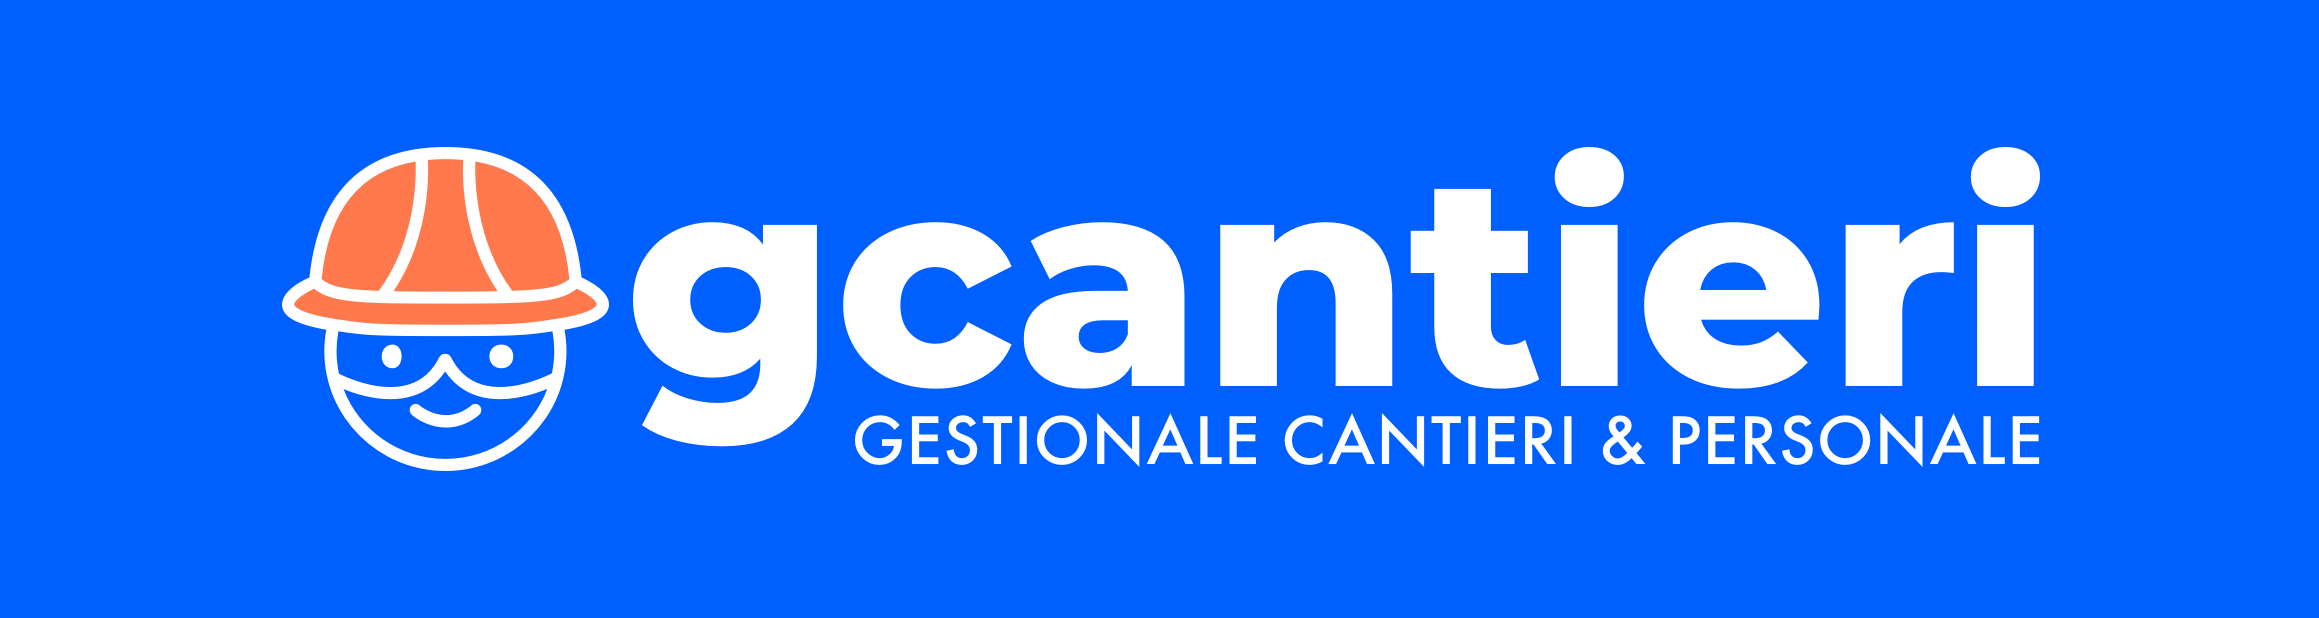 logo gcantieri sfondo blu - Gcantieri - Gestionale Cantieri e Personale